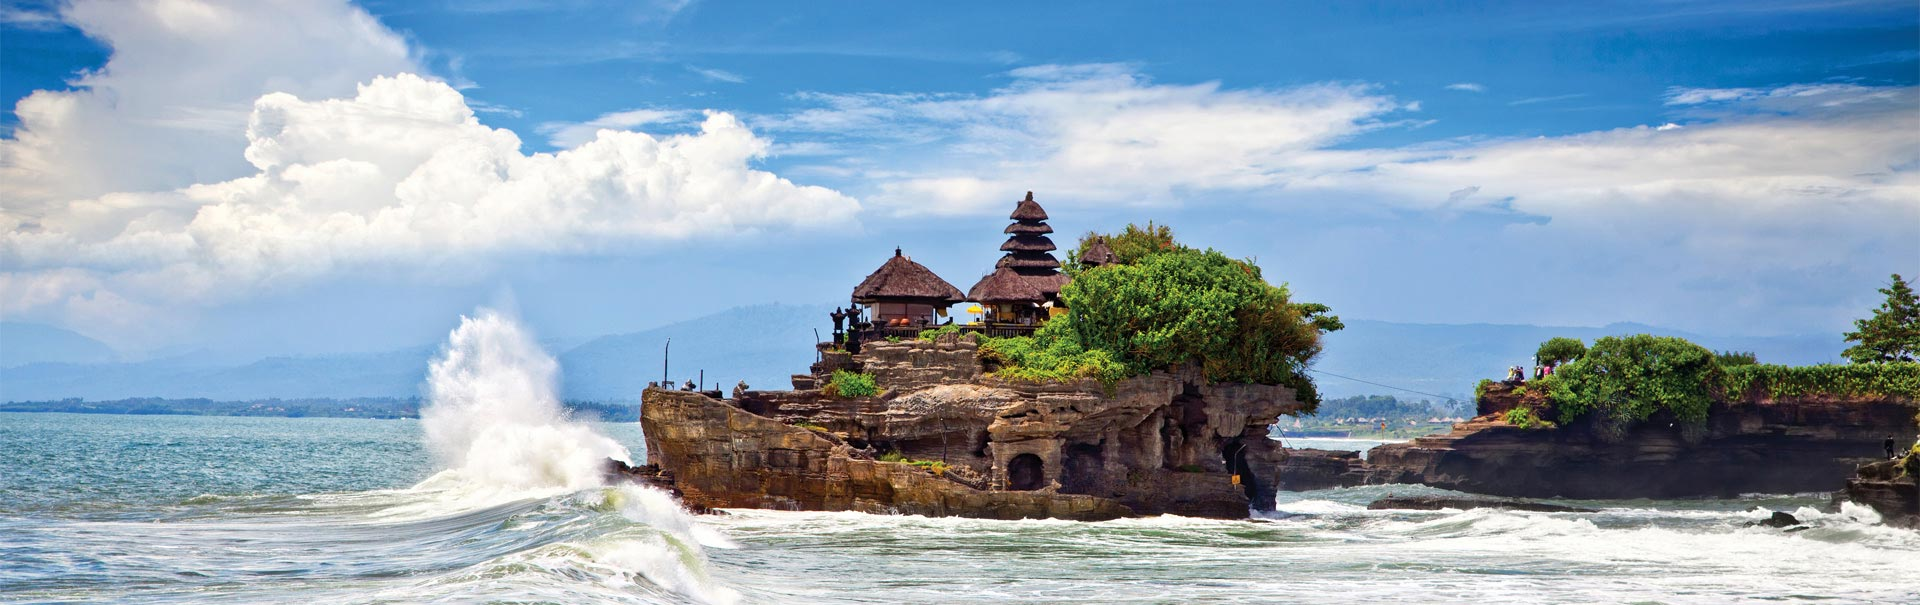 Honeymoon Tour - Bali (ASHL) Banner